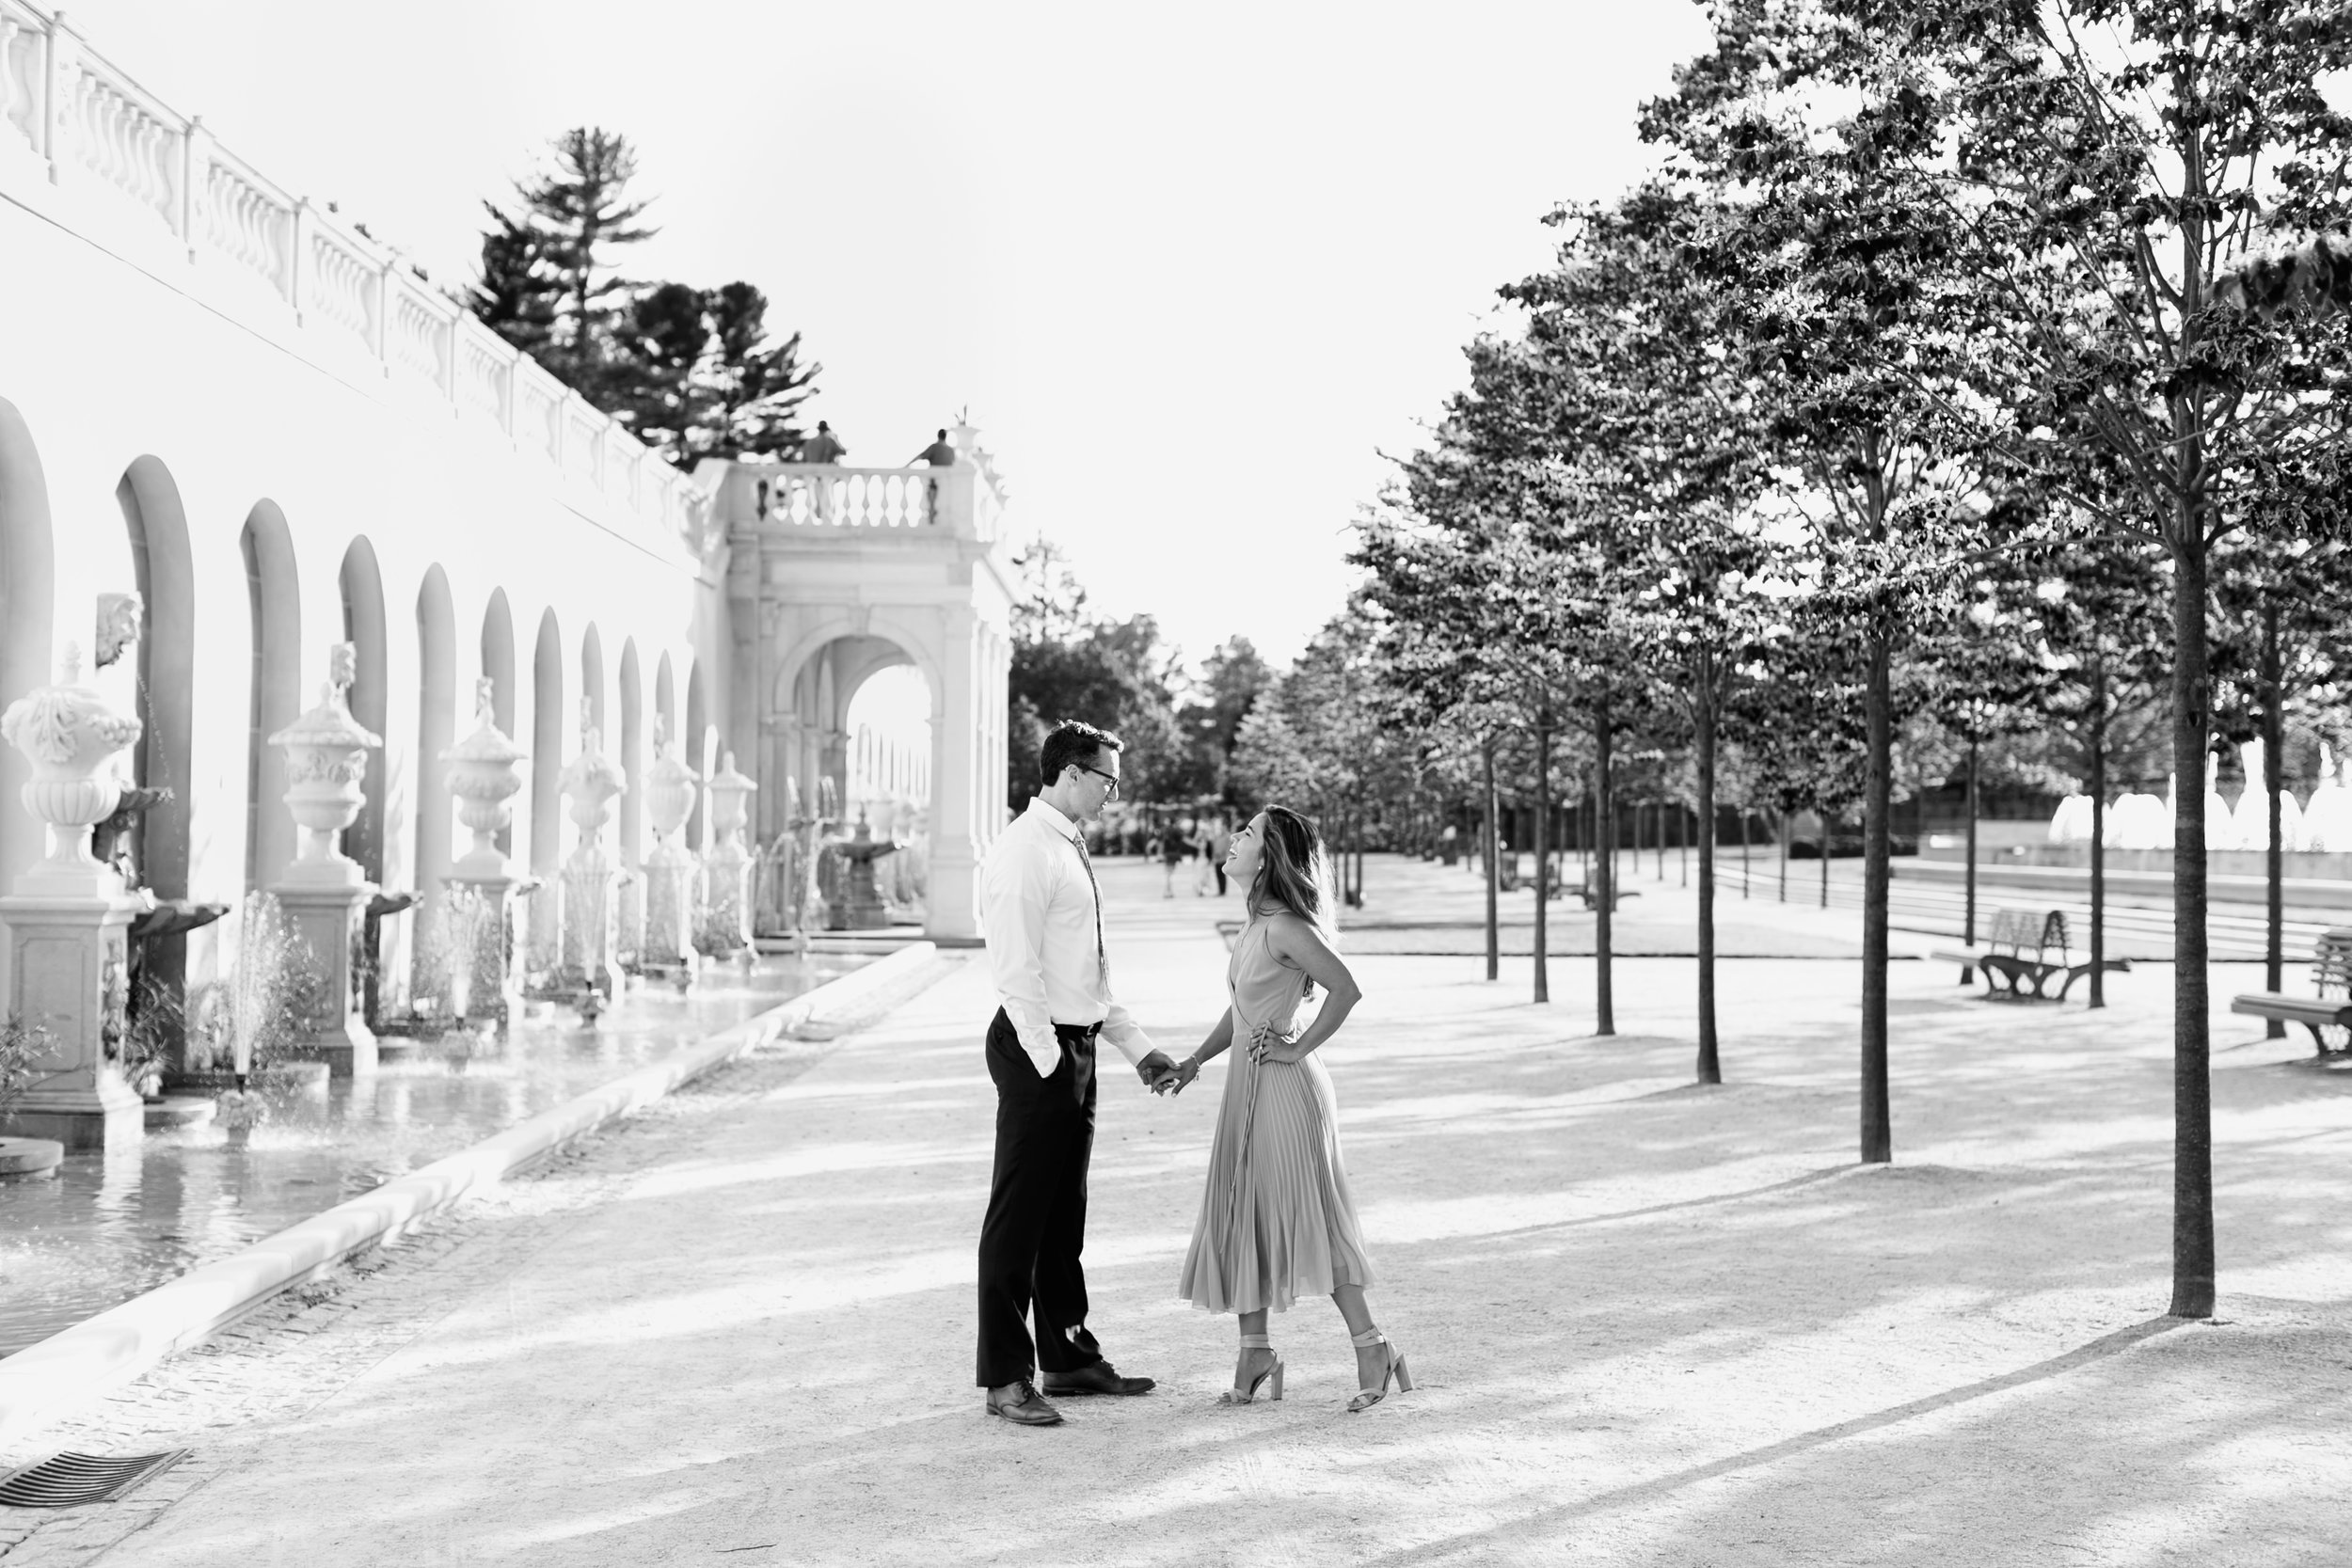 photography-natural-candid-engaged-proposal-philadelphia-wedding-longwood gardends-nature-flowers-modern-lifestyle-18.JPG